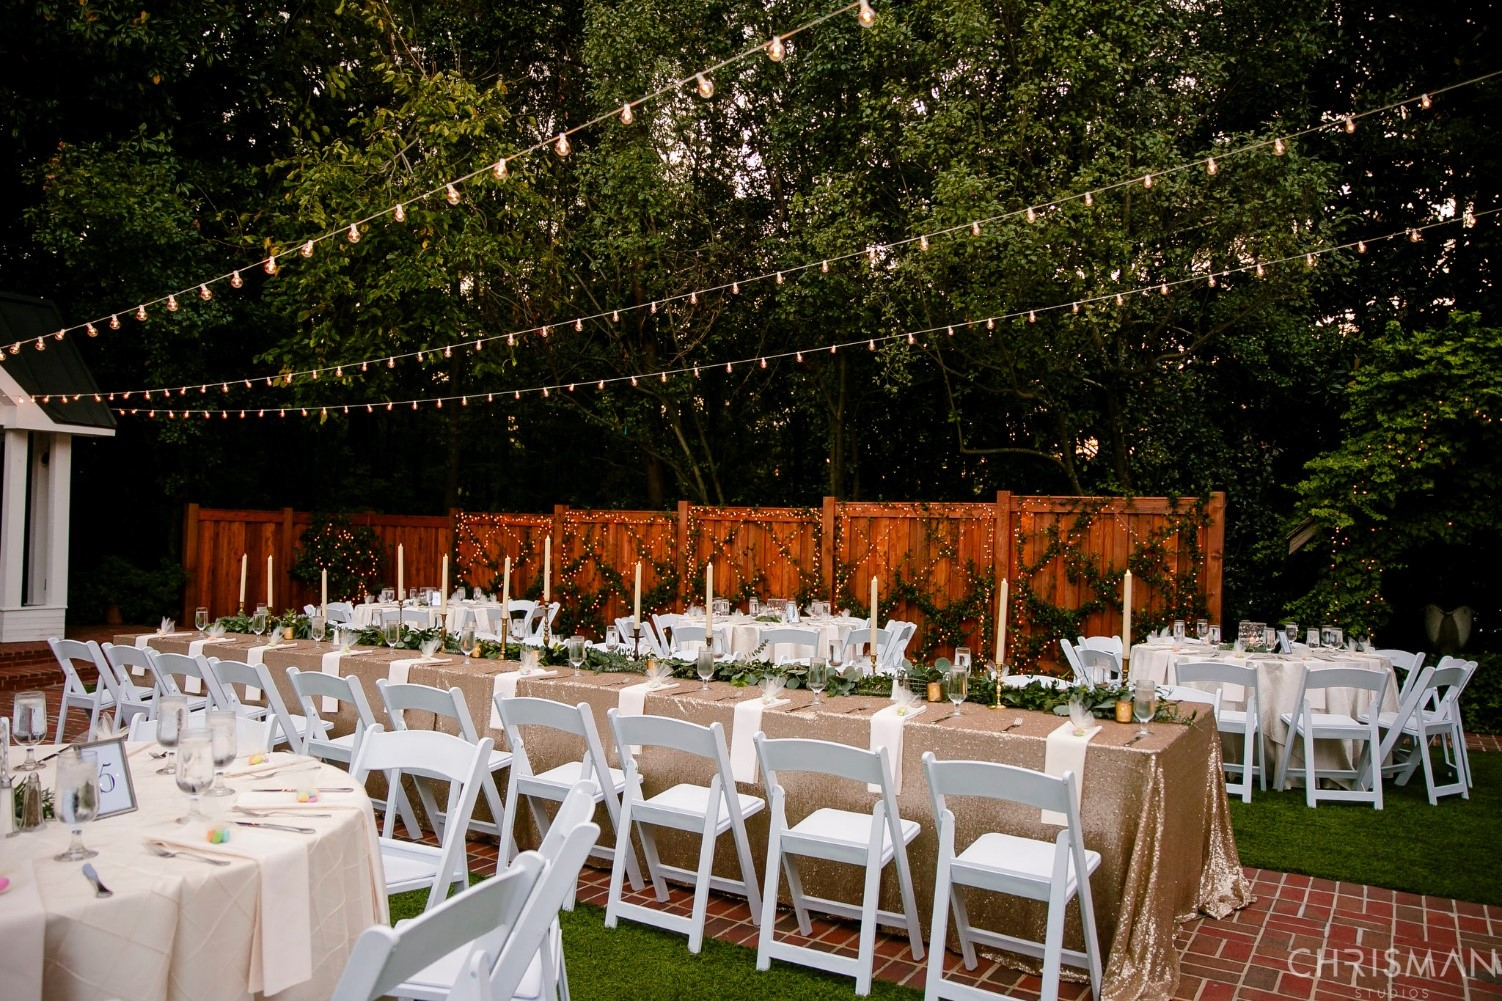 Courtyard Dinner Service 4.jpg